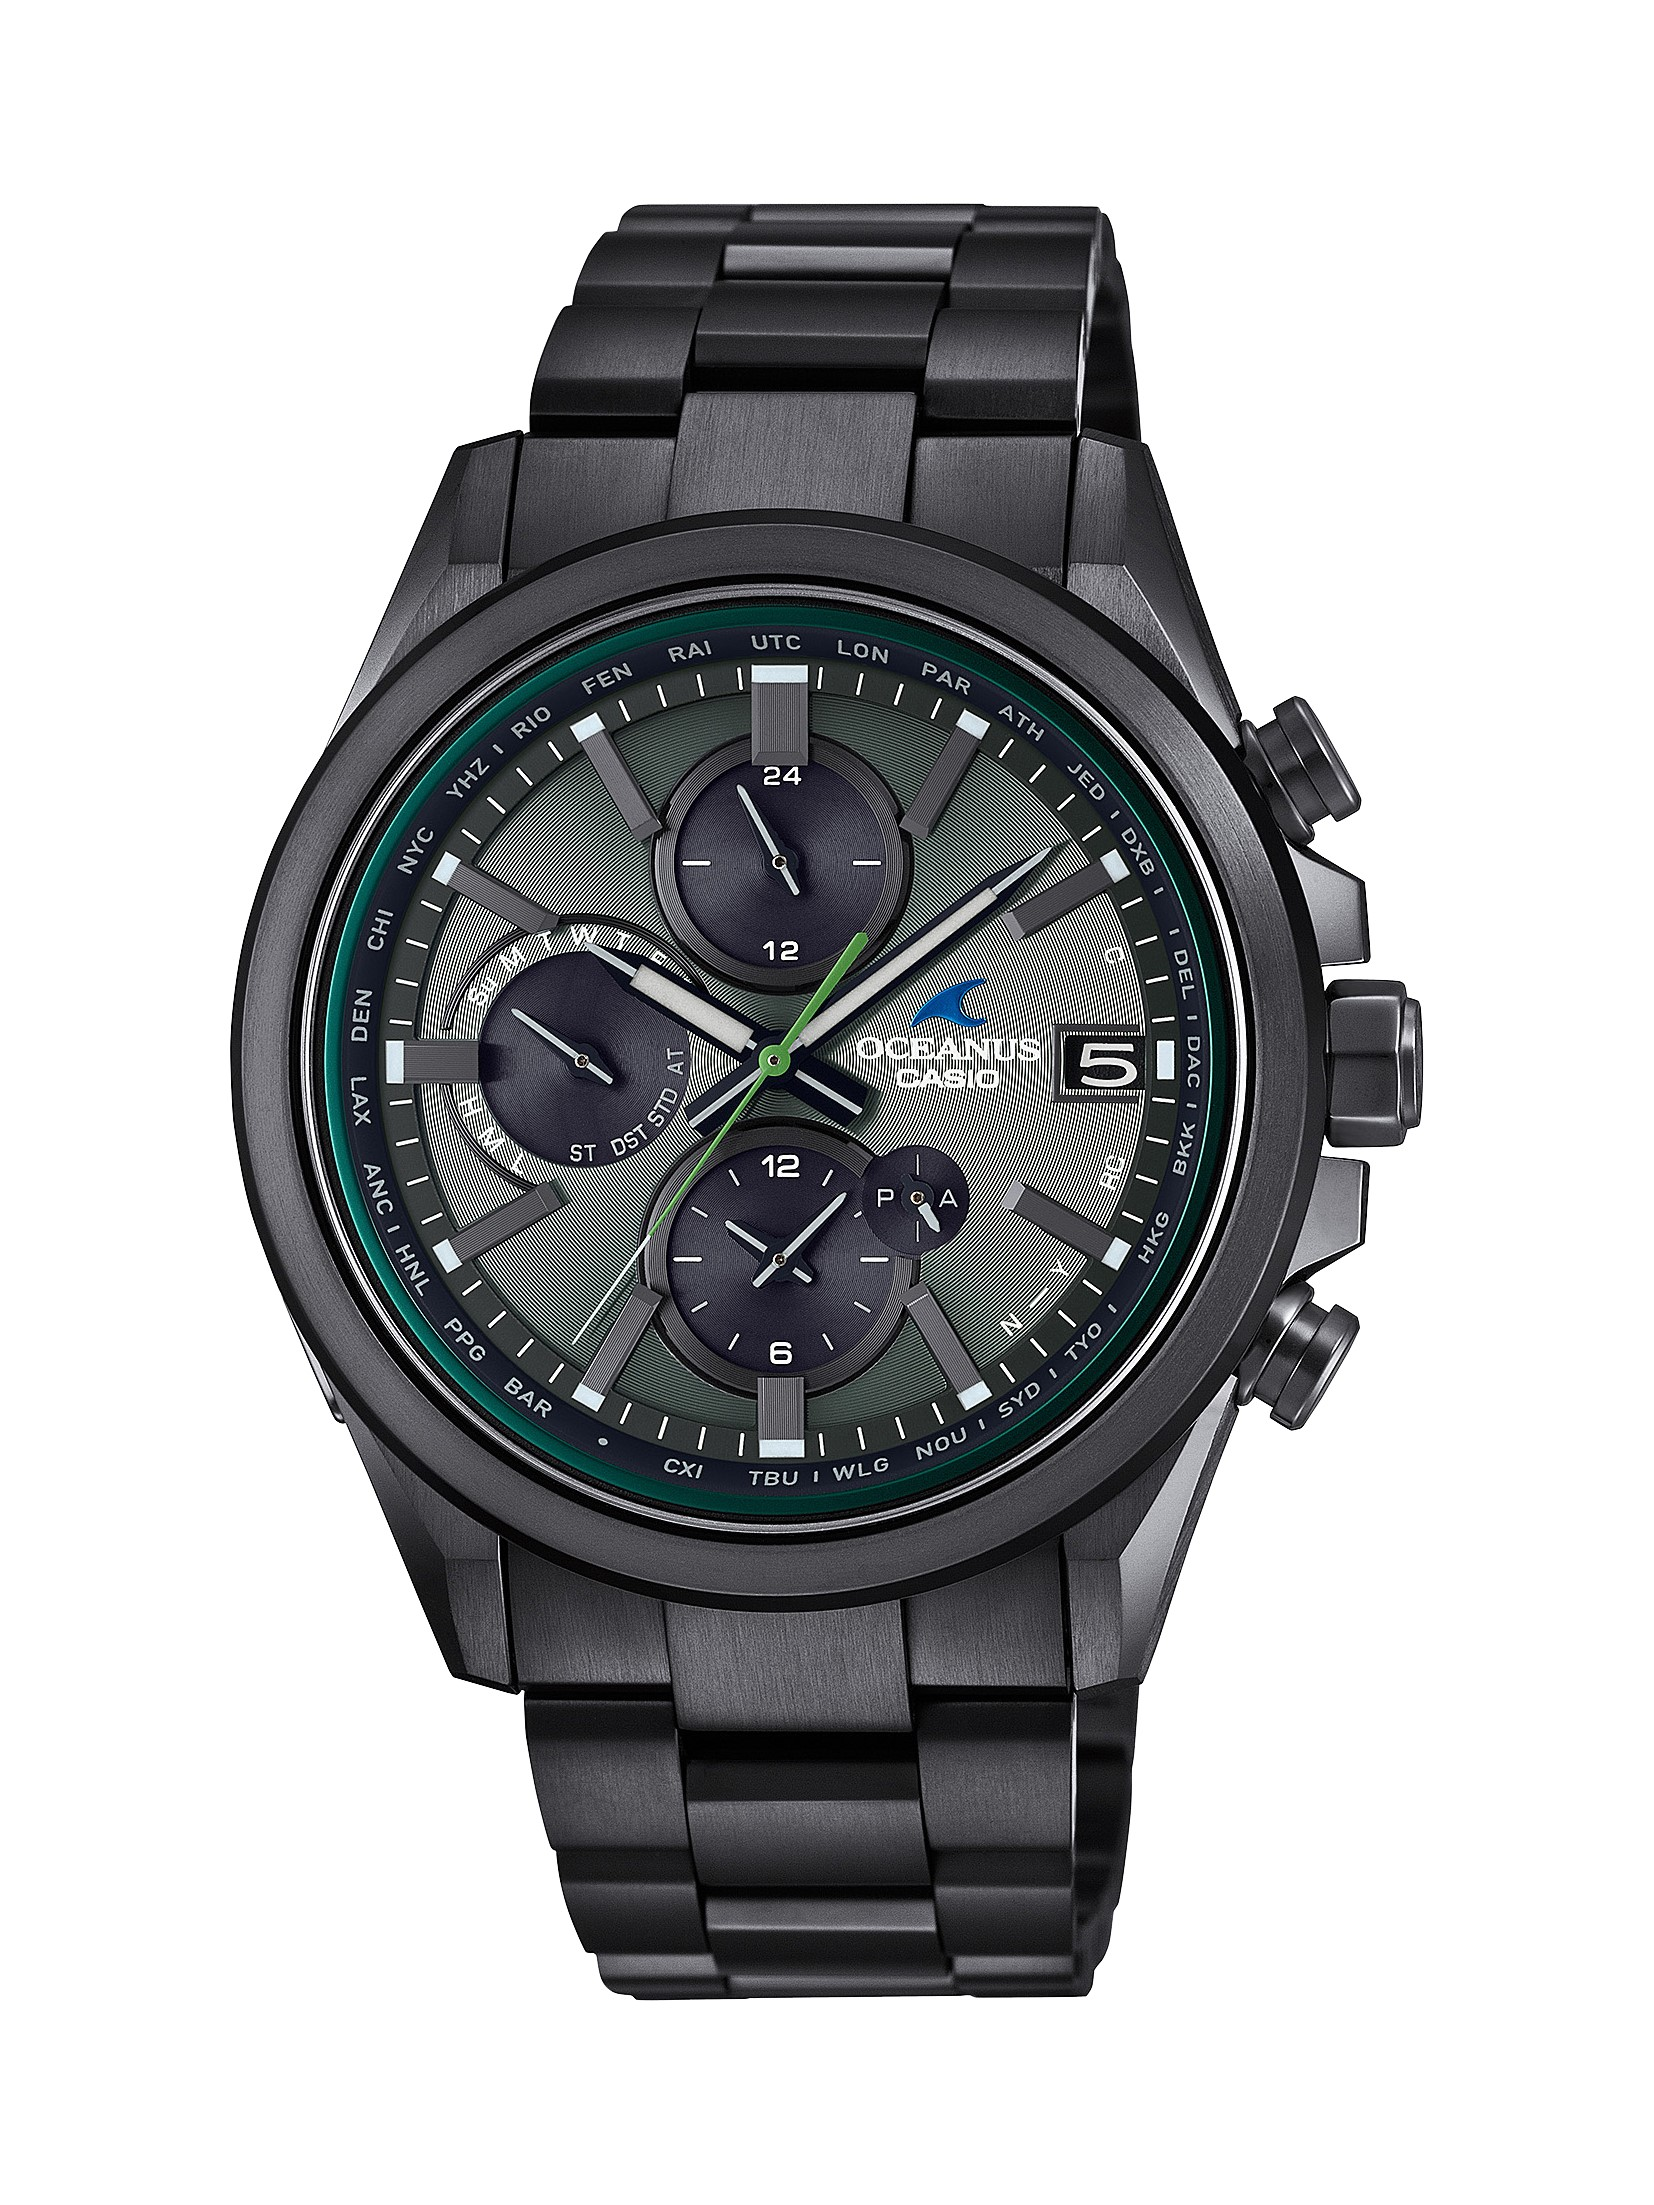 CASIO腕時計 OCEANUS OCW-T4000BA-1A3JF C-0159